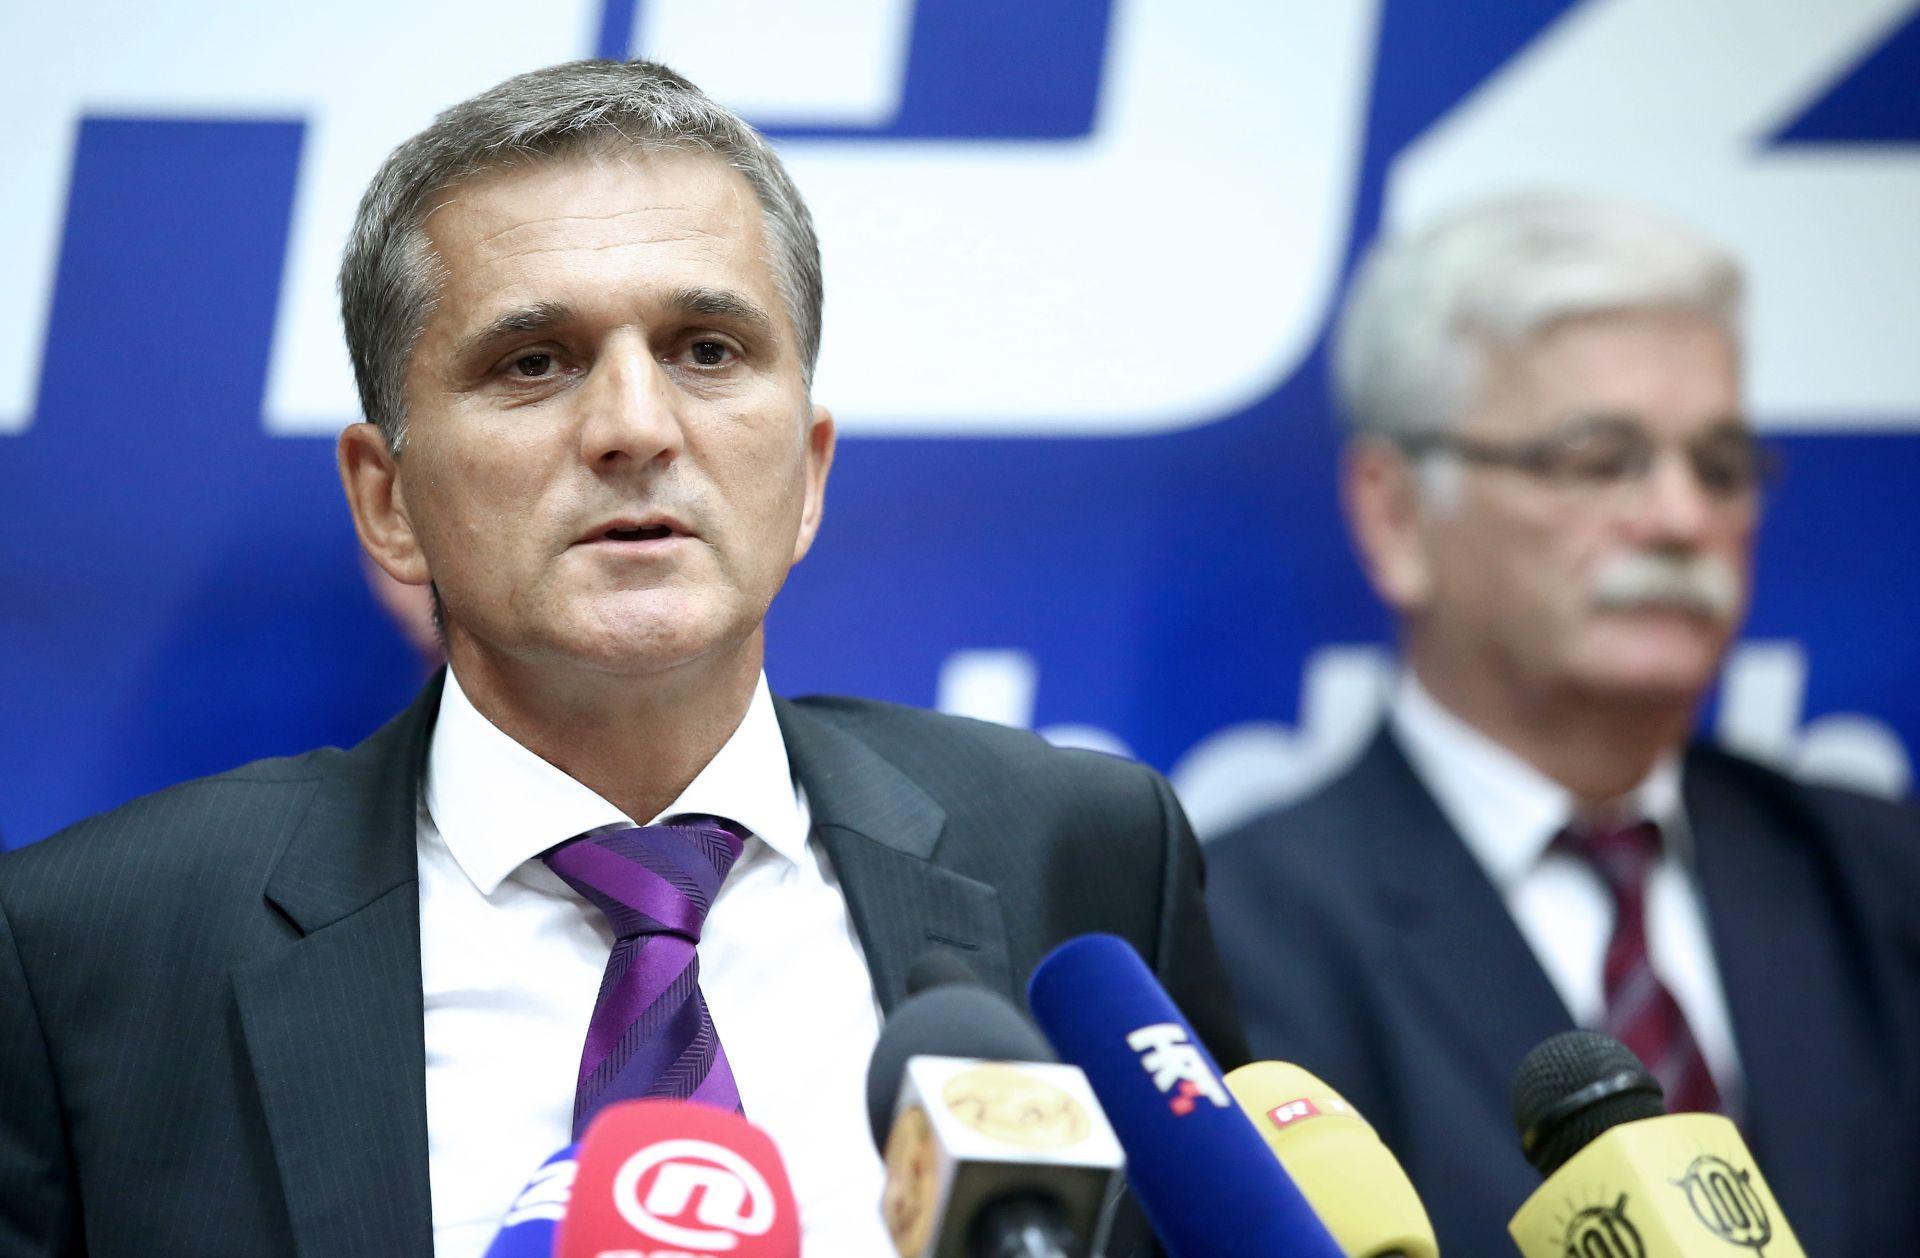 PREOKRET Plenkovićeva Vlada imat će 20 ministara